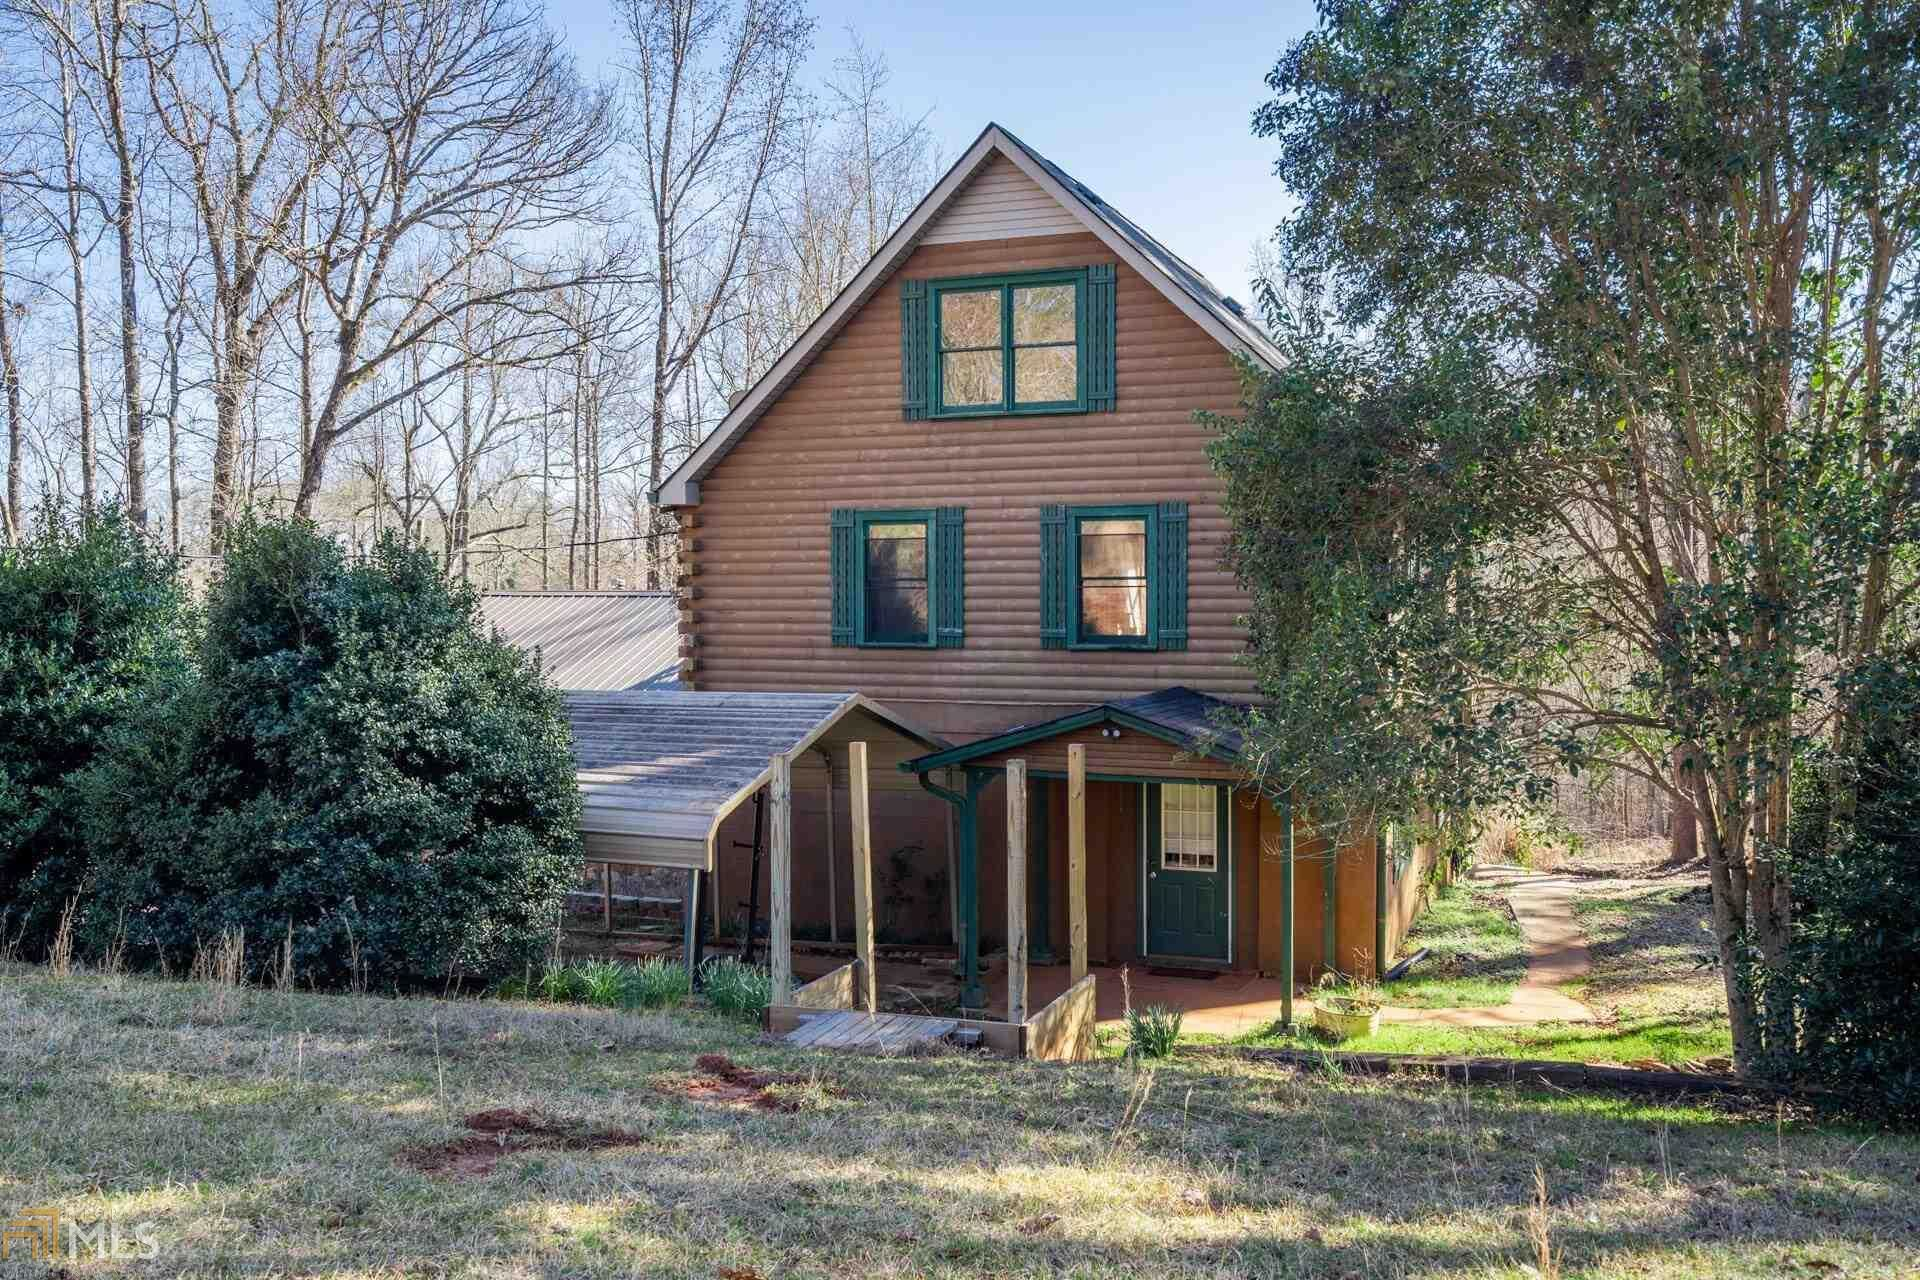 3510 Concord Rd, Newborn, GA 30056 - MLS#: 8745606